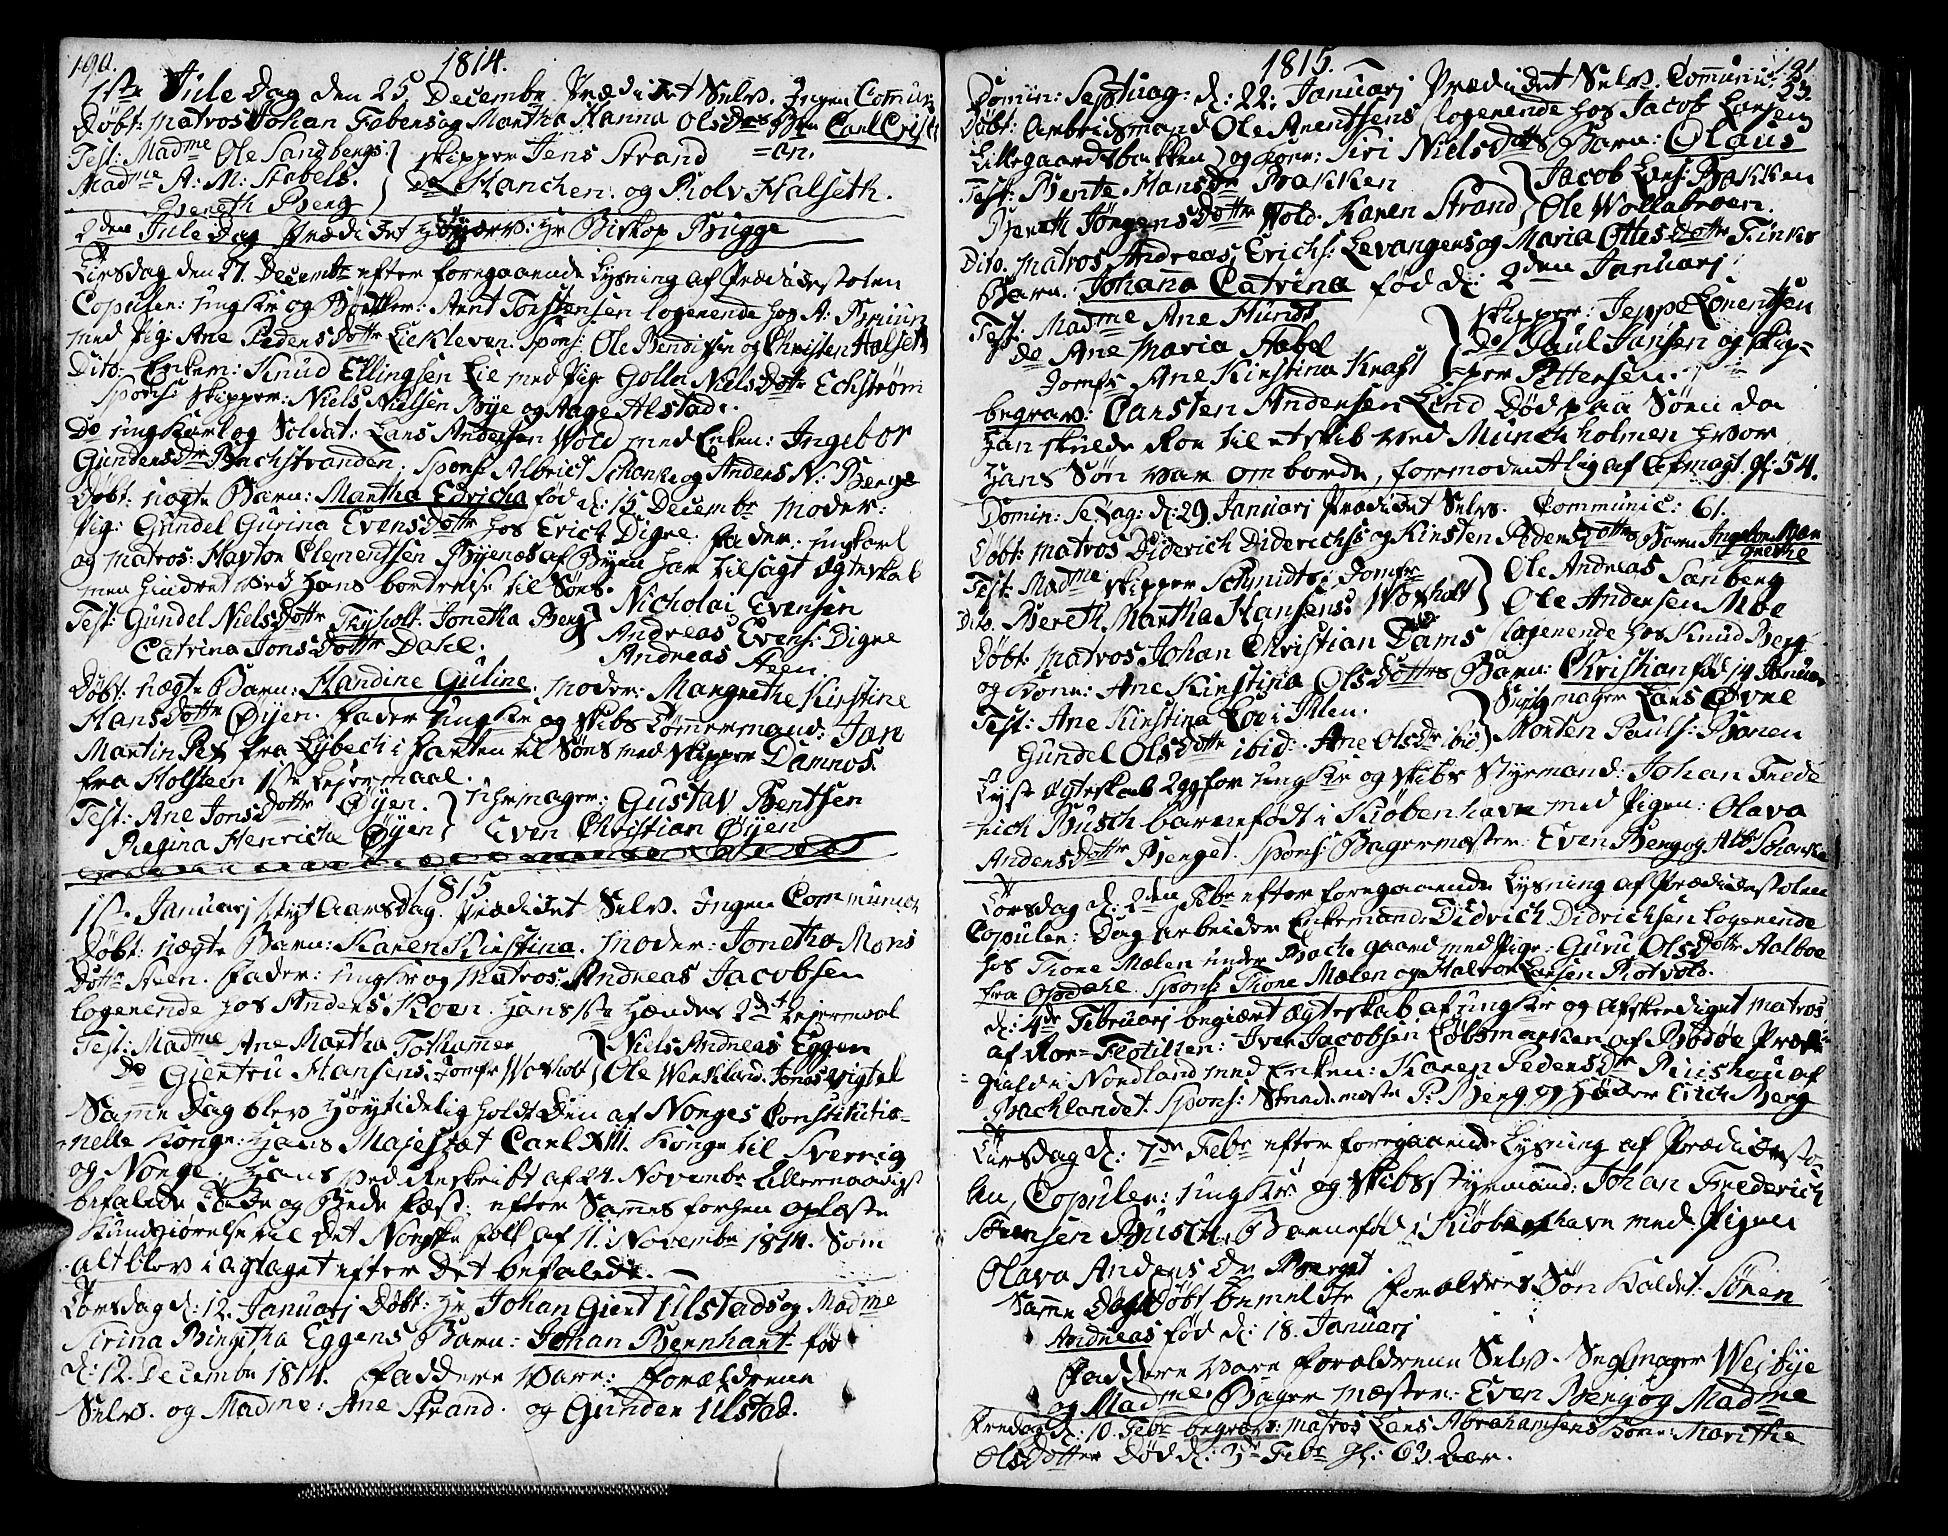 SAT, Ministerialprotokoller, klokkerbøker og fødselsregistre - Sør-Trøndelag, 604/L0181: Parish register (official) no. 604A02, 1798-1817, p. 190-191